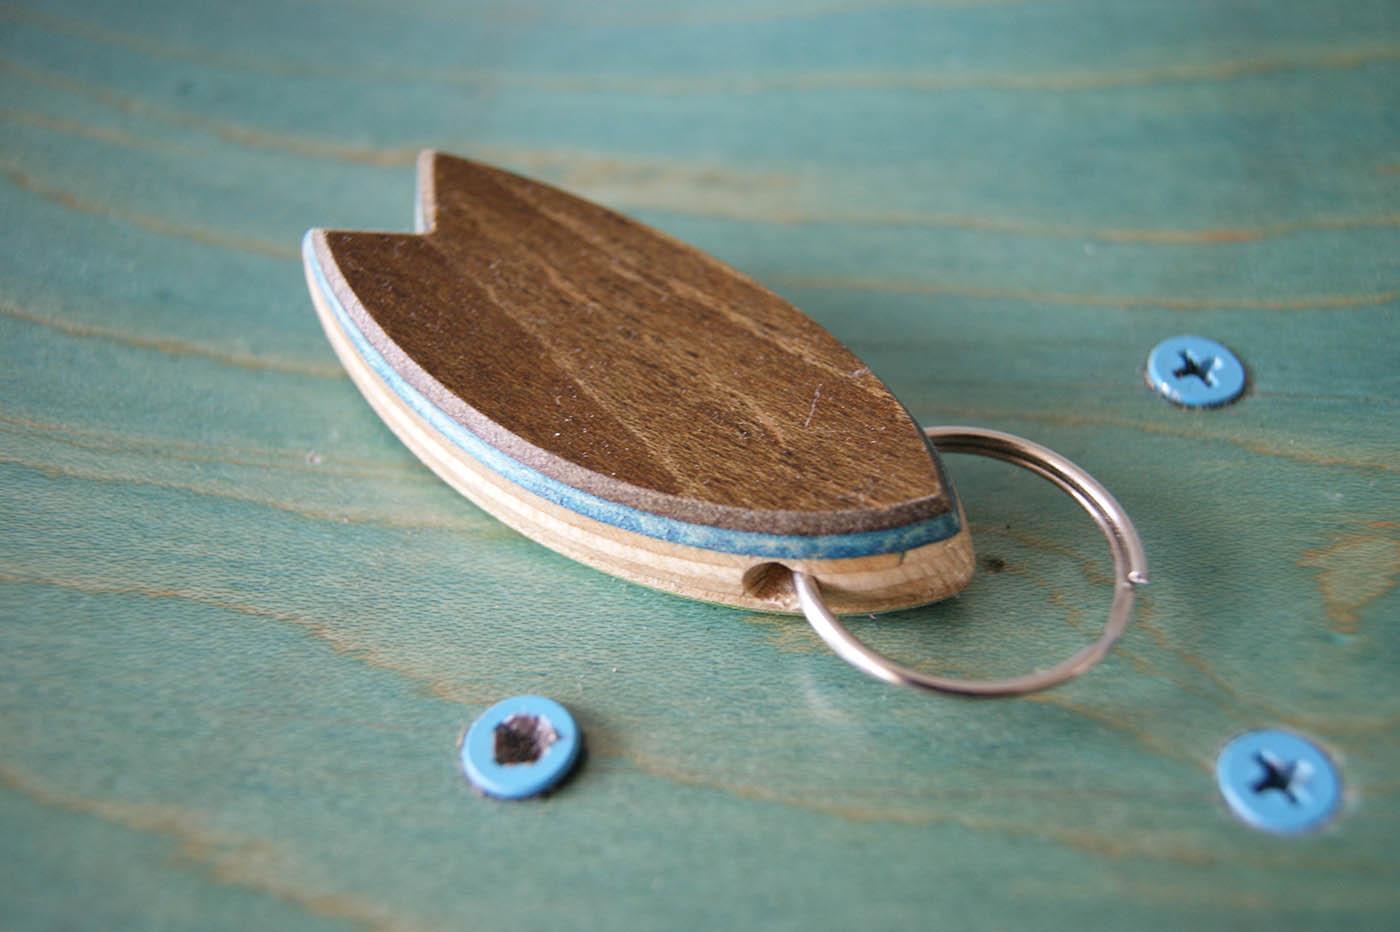 4-Skatan-LLC-Surfboard-Key-Chain-Skateboarding-Upcycling (91)